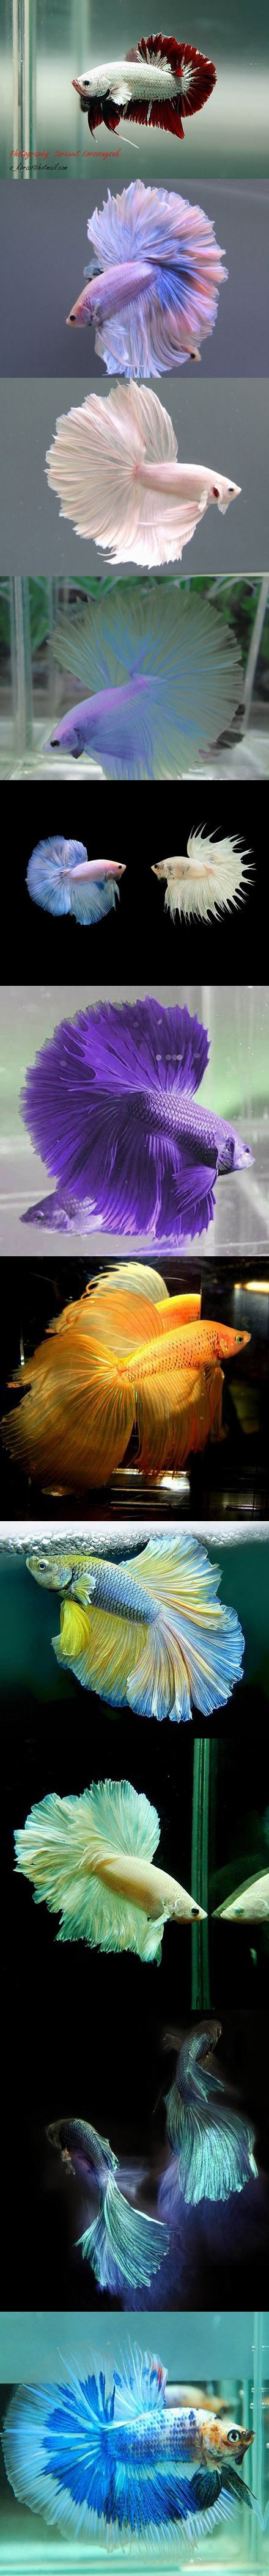 Bettas are so coolBettafish, Siamese Fighting Fish, Fancy Fishy, Fish Tanks, Fight Fish, Beta Fish, Beautiful Betta, Animal, Betta Fish